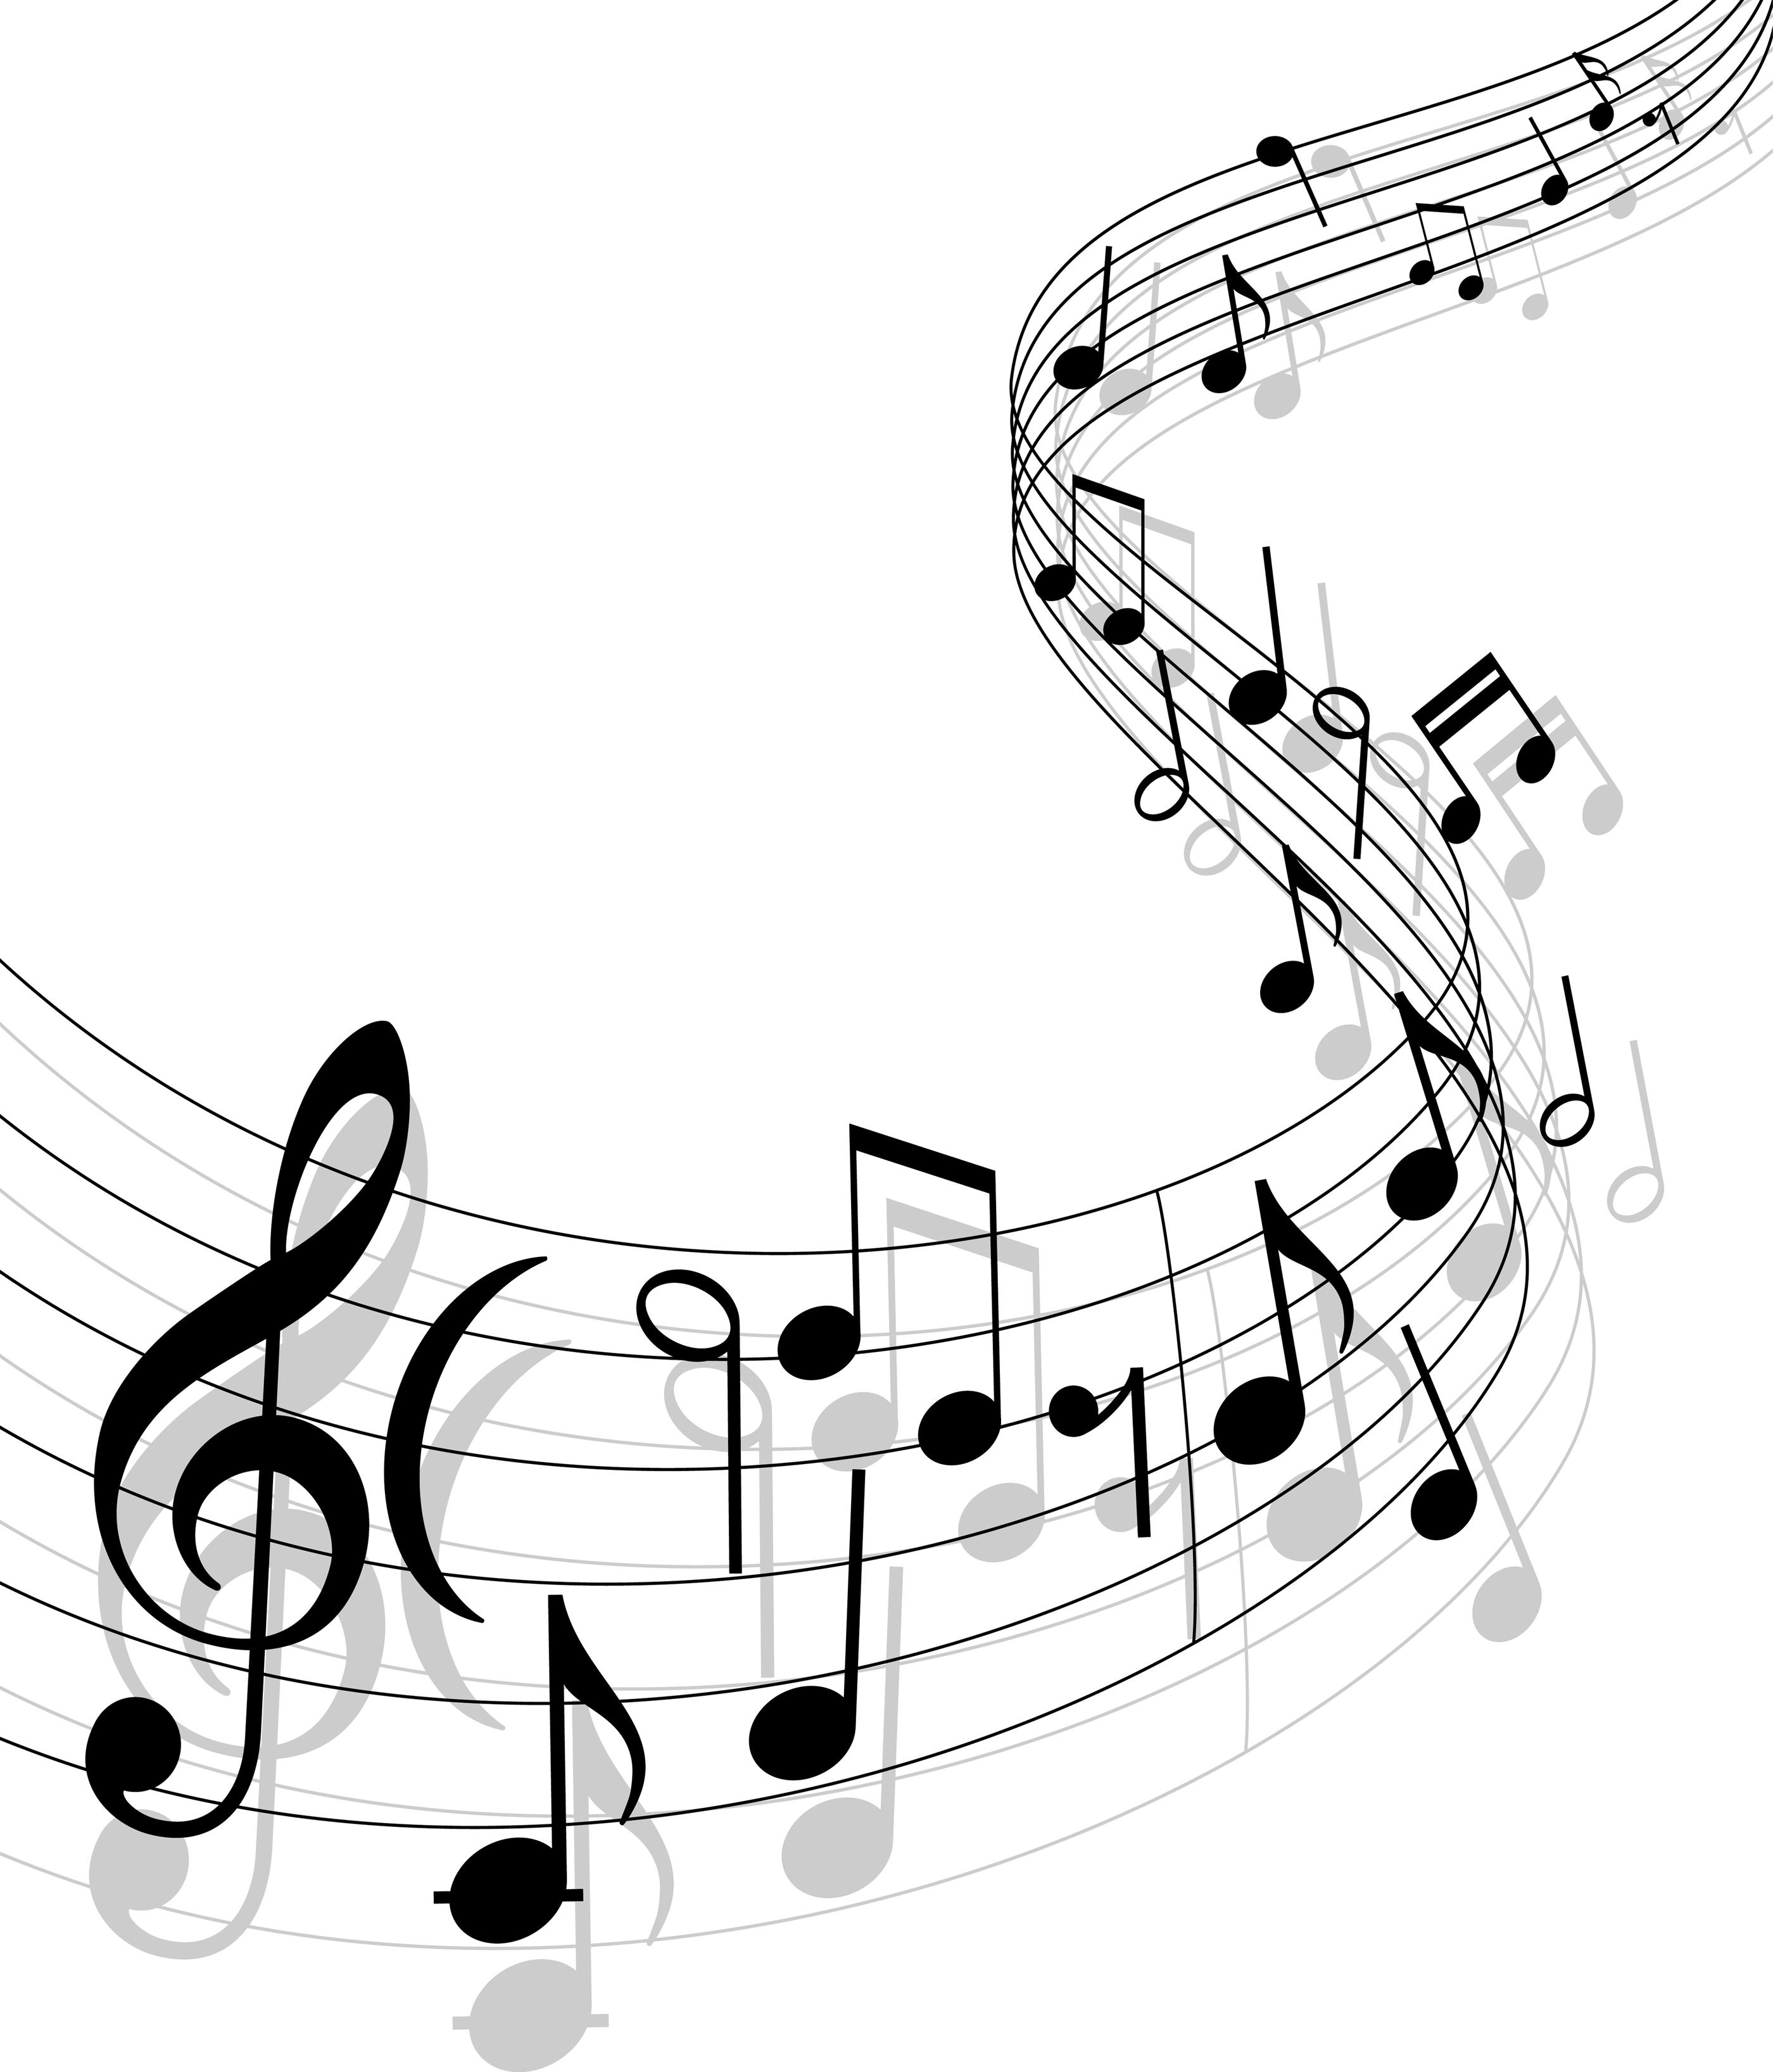 Musician clipart music program. Gospel free download best